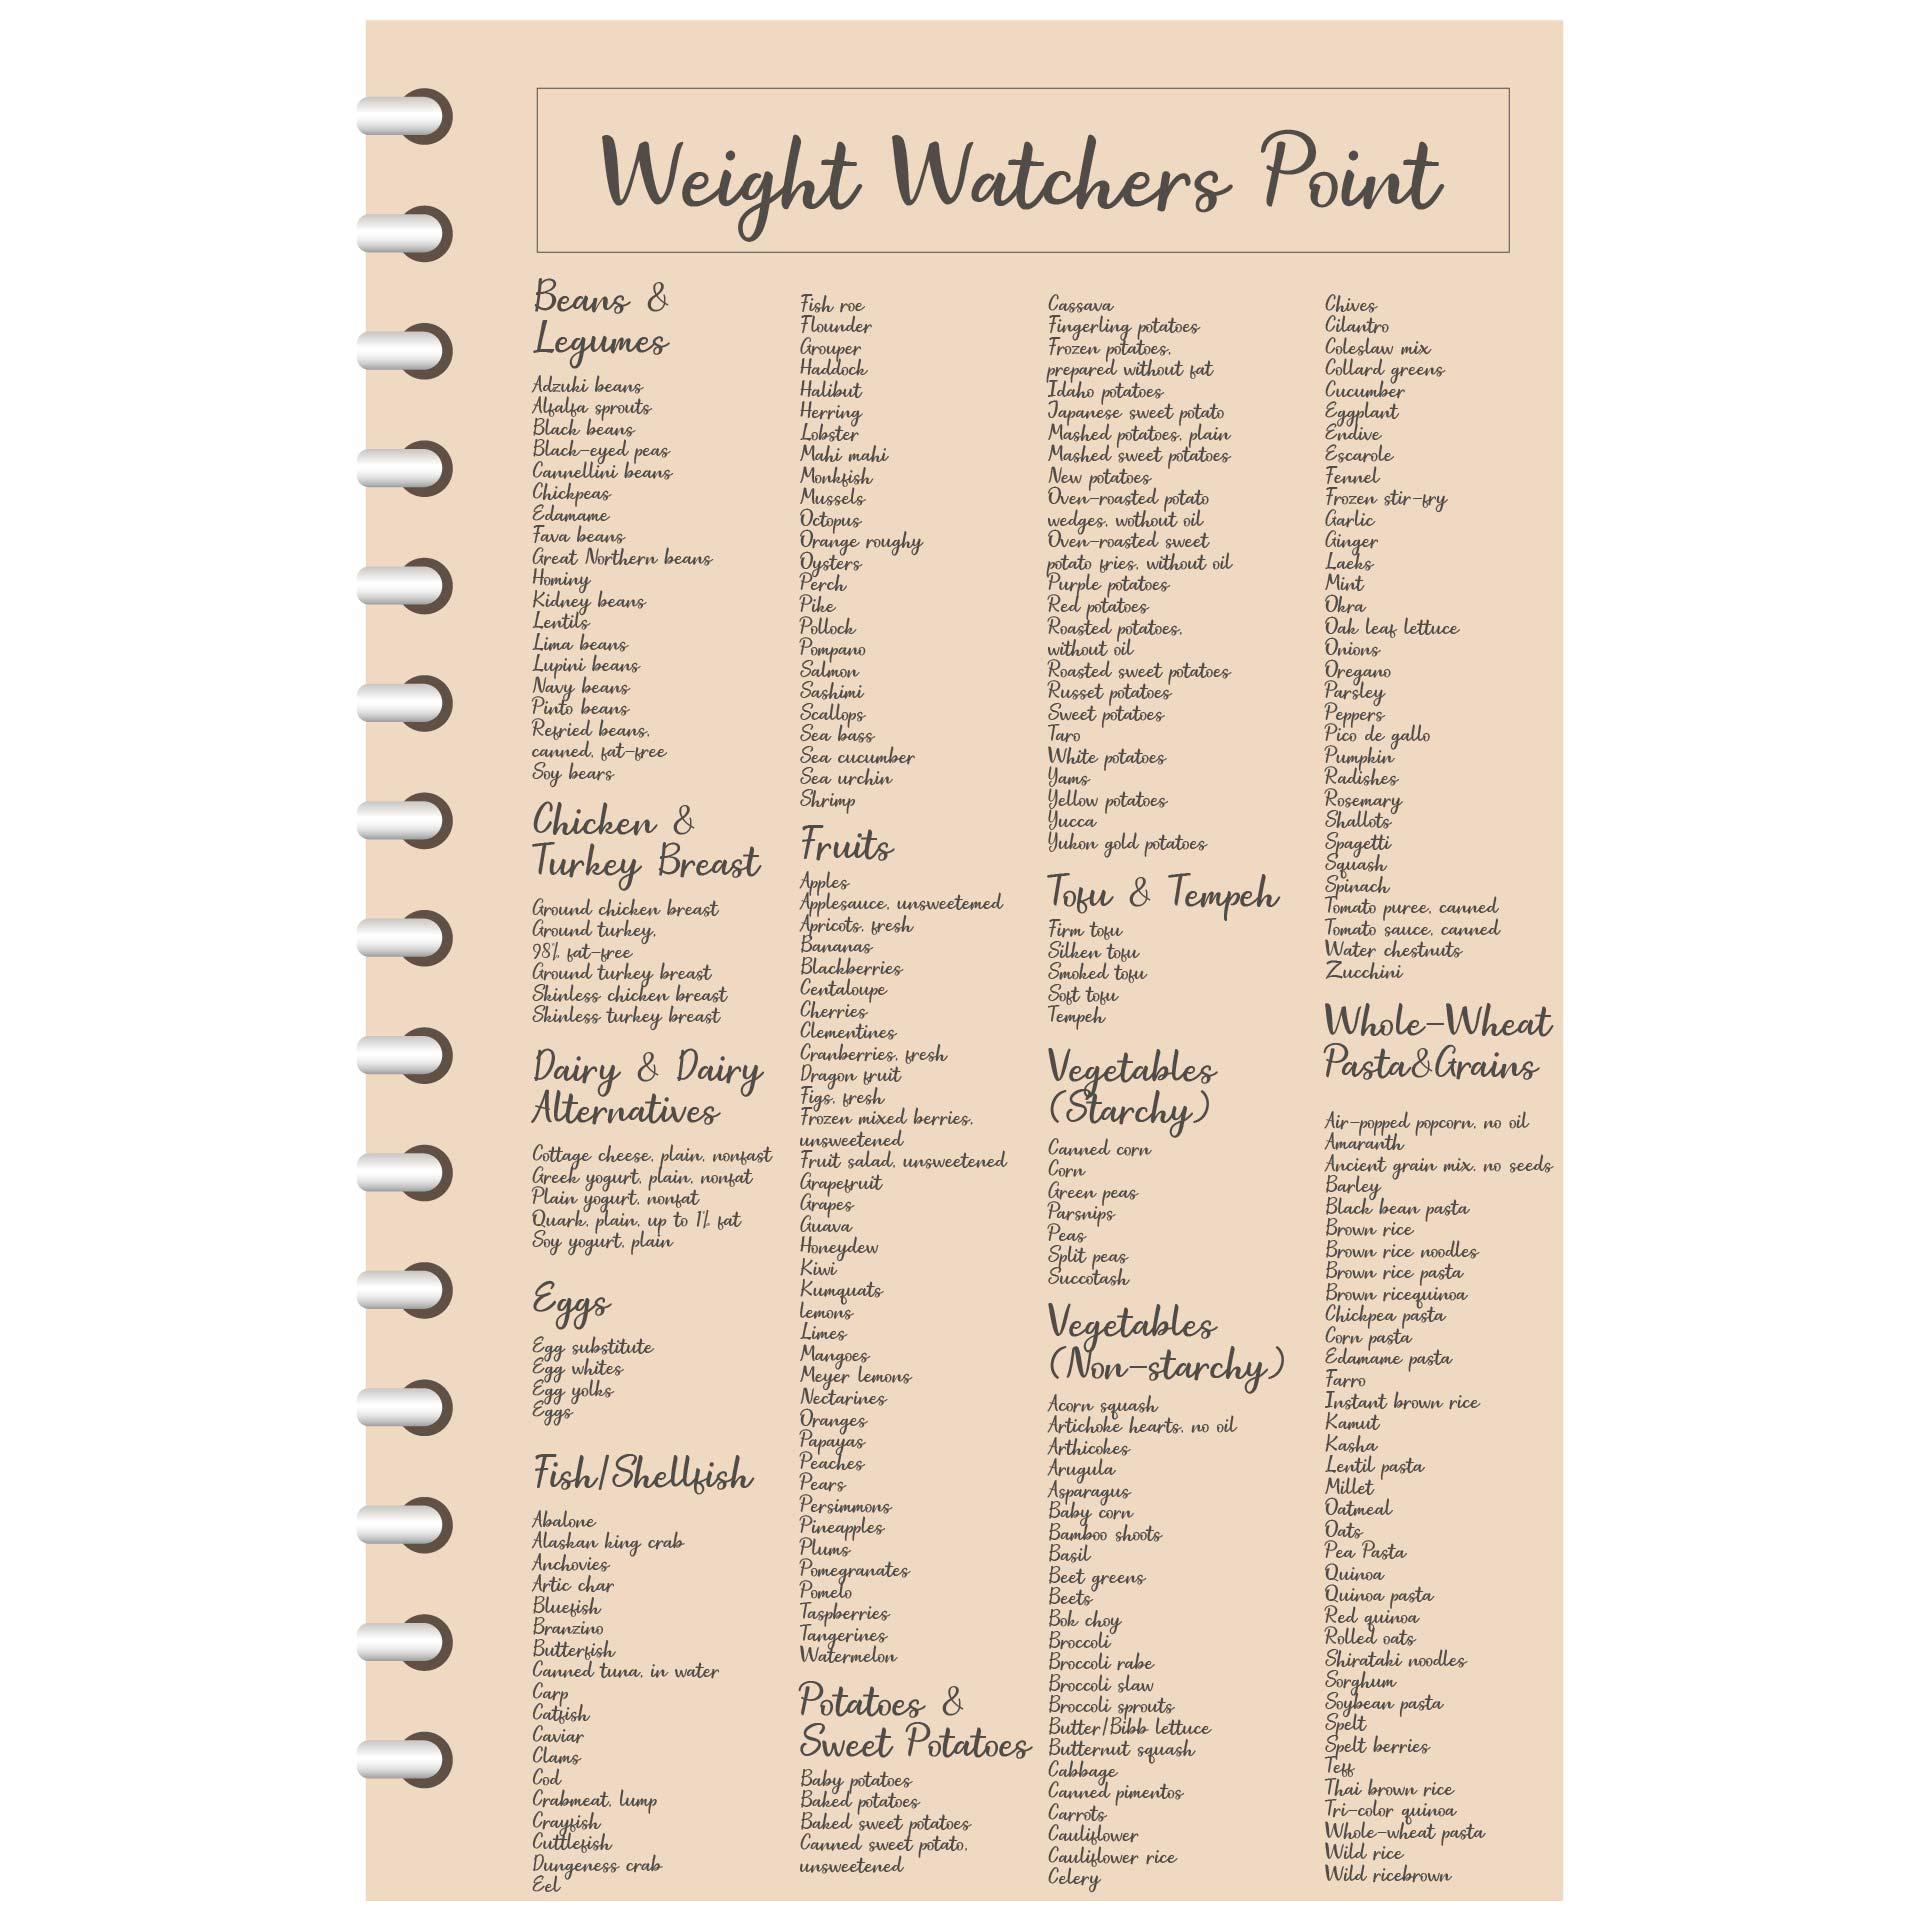 Weight Watchers Points Book